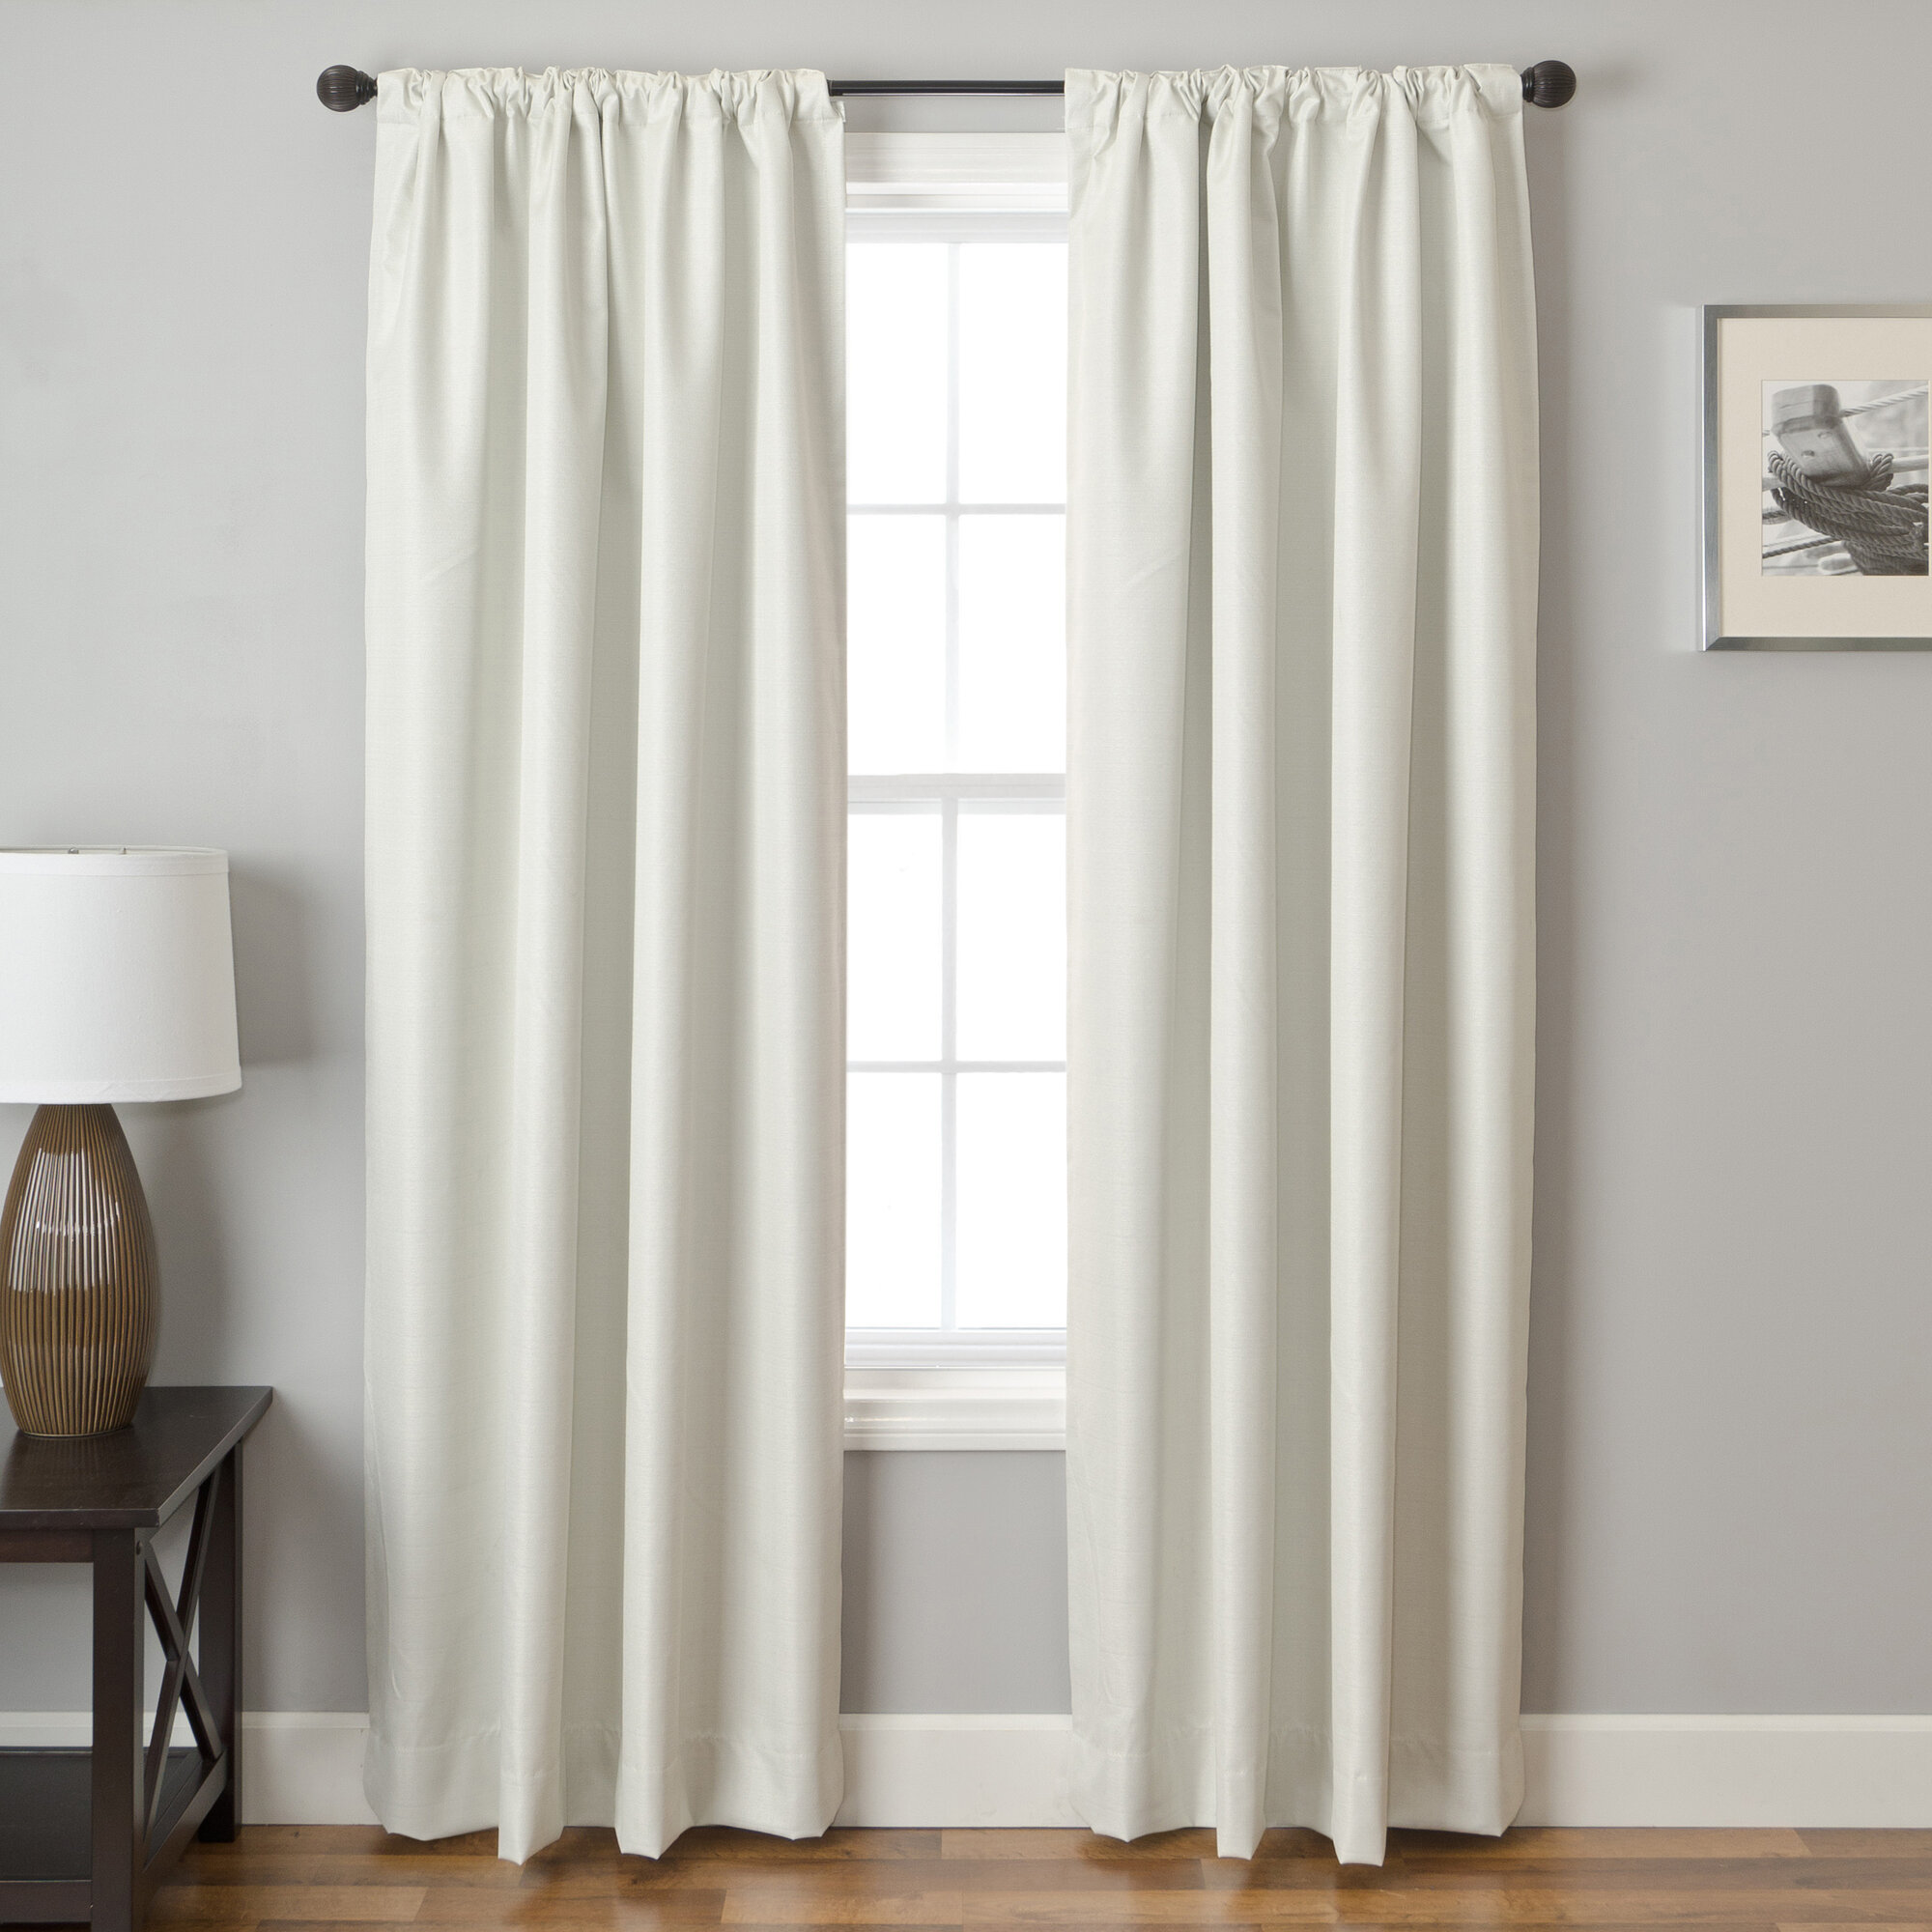 Softline Home Fashions Mural Curtain Panel